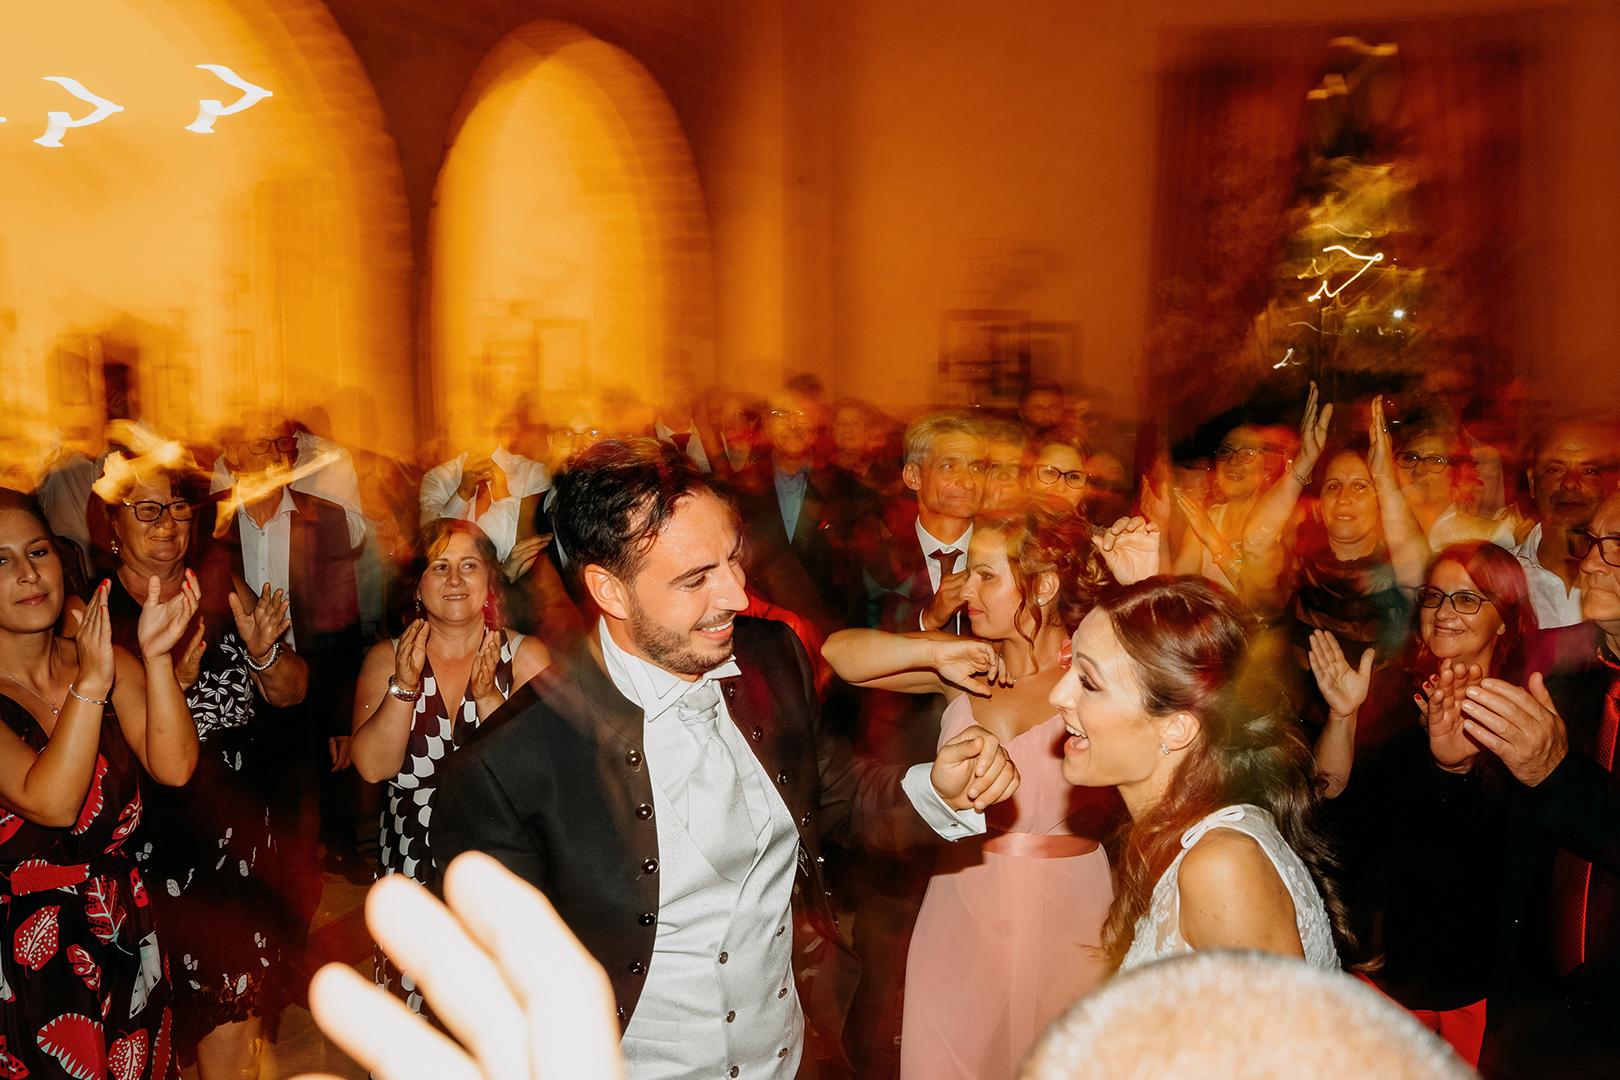 69 gianni-lepore-balli-amici-sposi